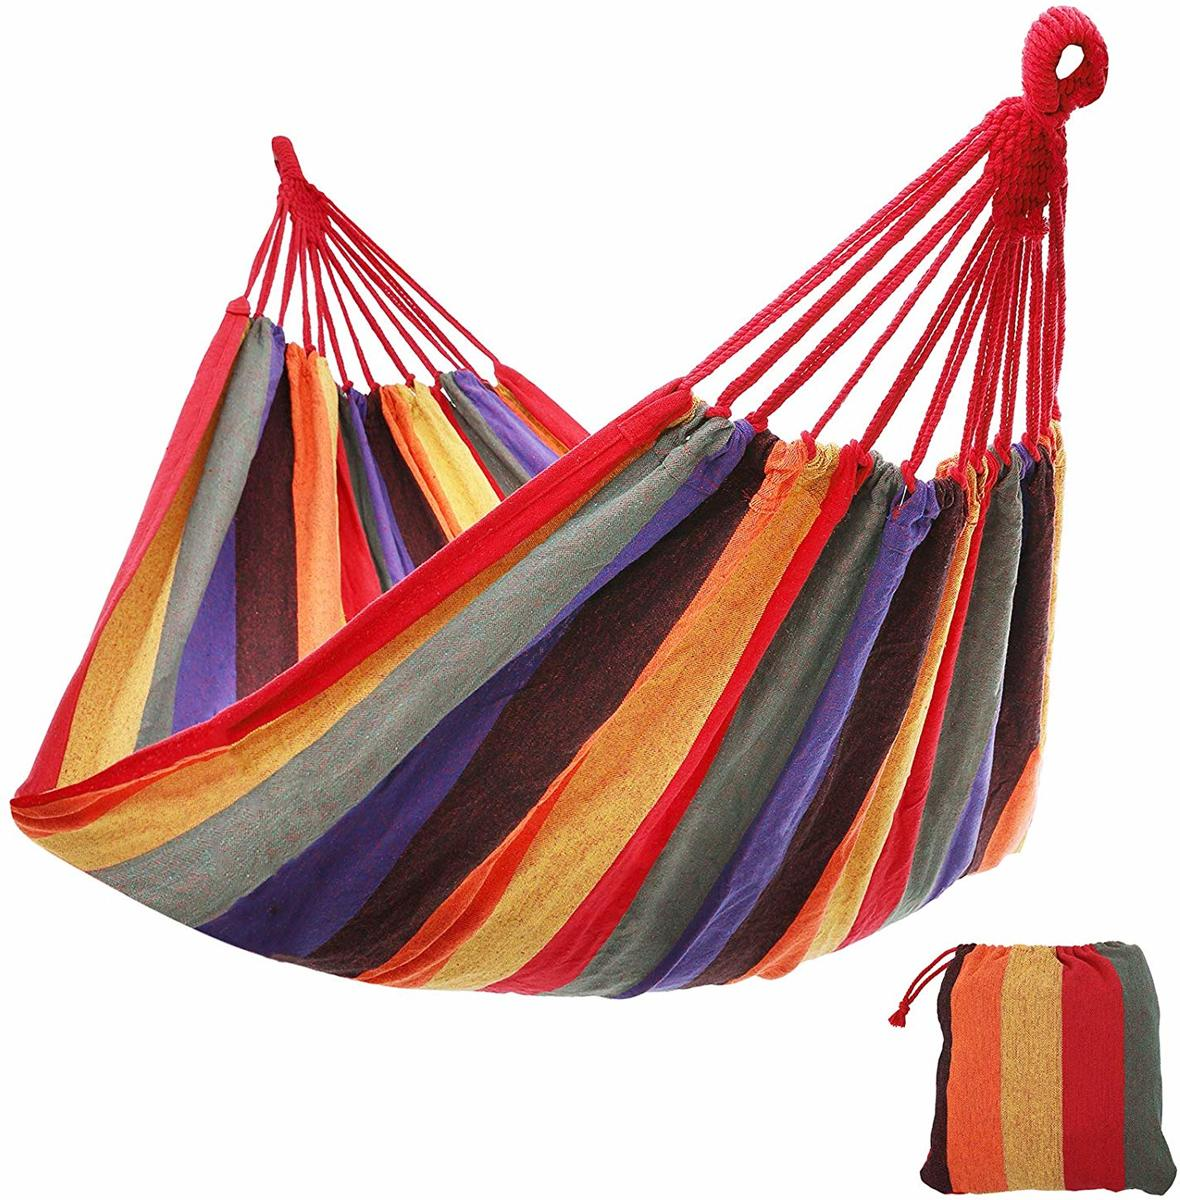 Plant&More - Hangmat - Multi Colour - Rood